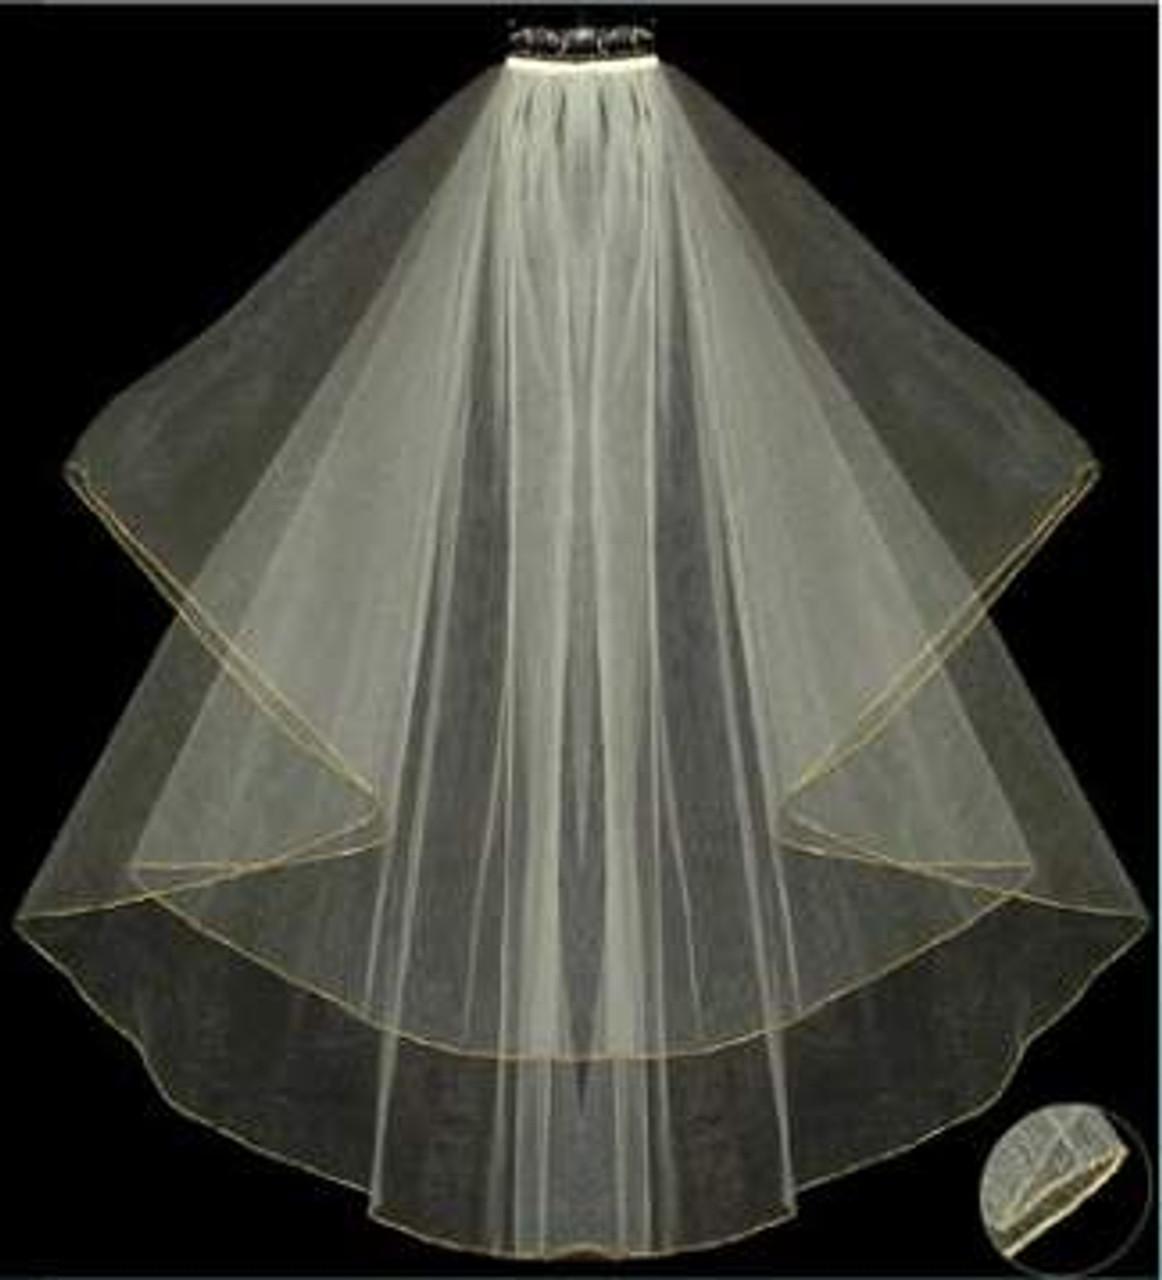 LC Bridal Style V2016-180 - Two Tier Fingertip Gold Thread Serged/Hemmed Edge Veil